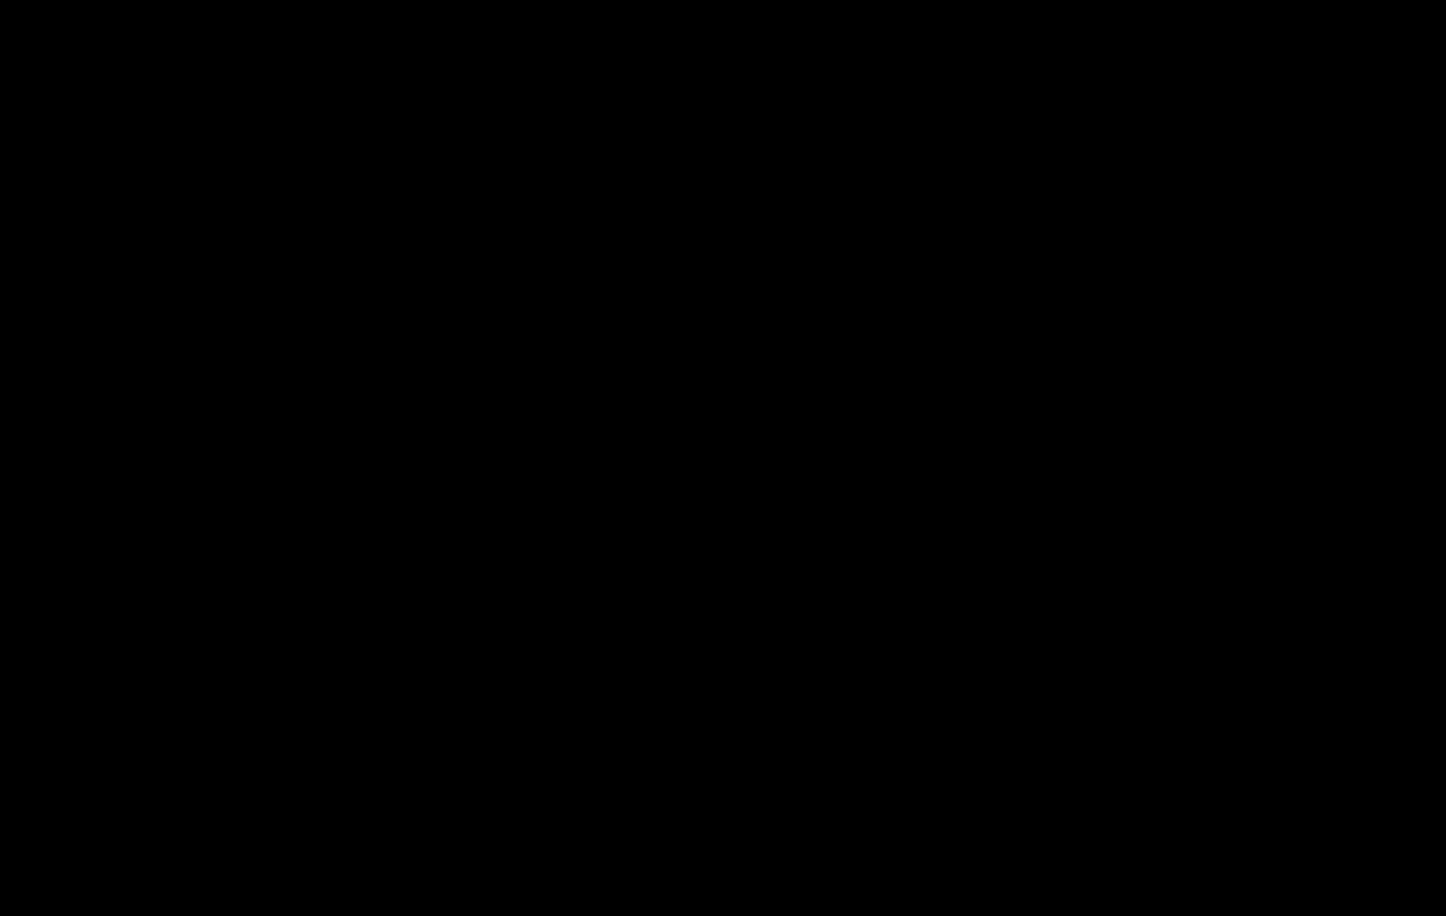 7-Dimethylamino-d<sub>6</sub>-coumarin-4-acetic acid propargylamide